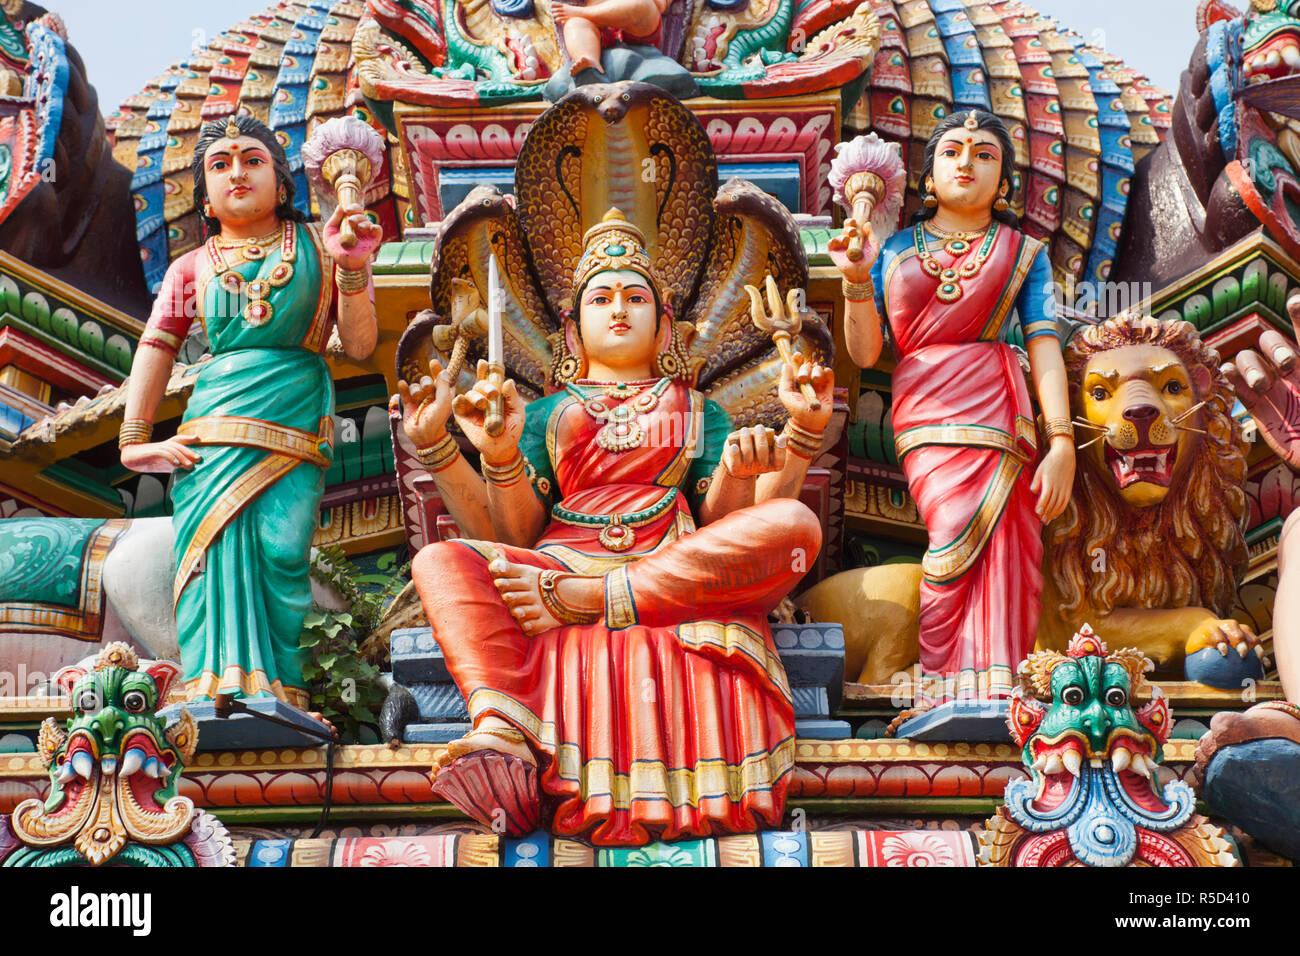 Singapore, Sri Mariamman Temple, Hindu Deities Adorning Roof of Main Prayer Hall - Stock Image